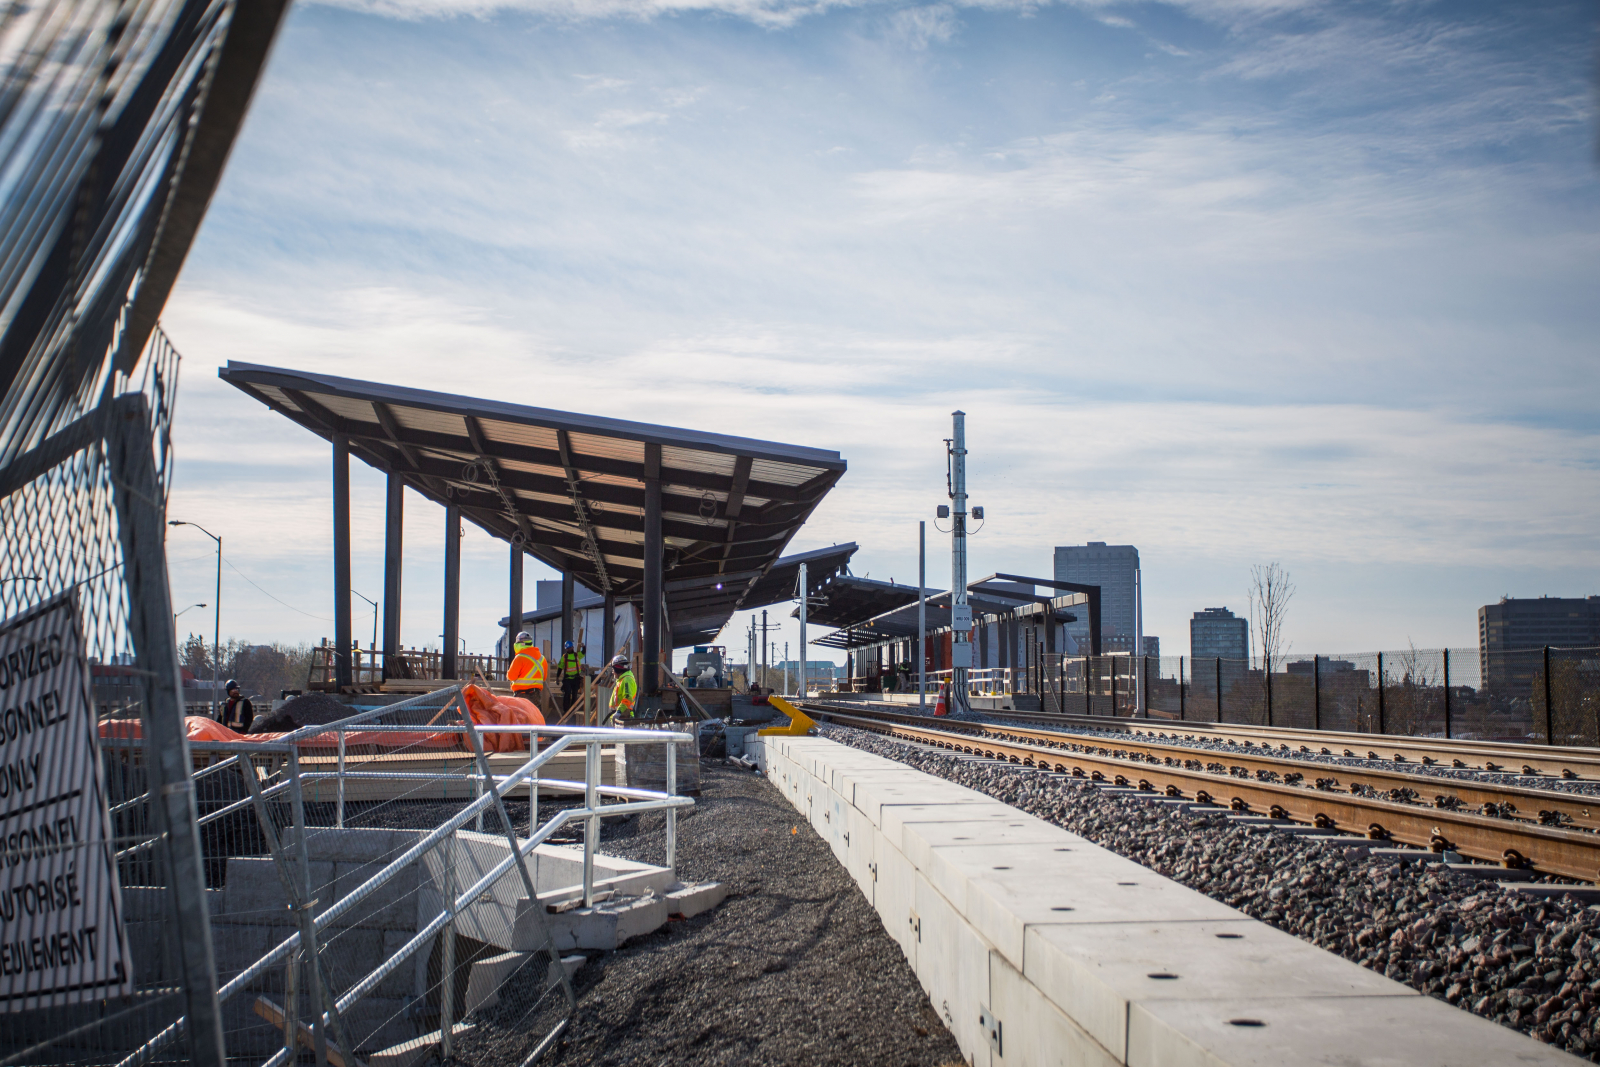 Rideau Centre, Ottawa, LRT, OC Transpo, University of Ottawa, public transit